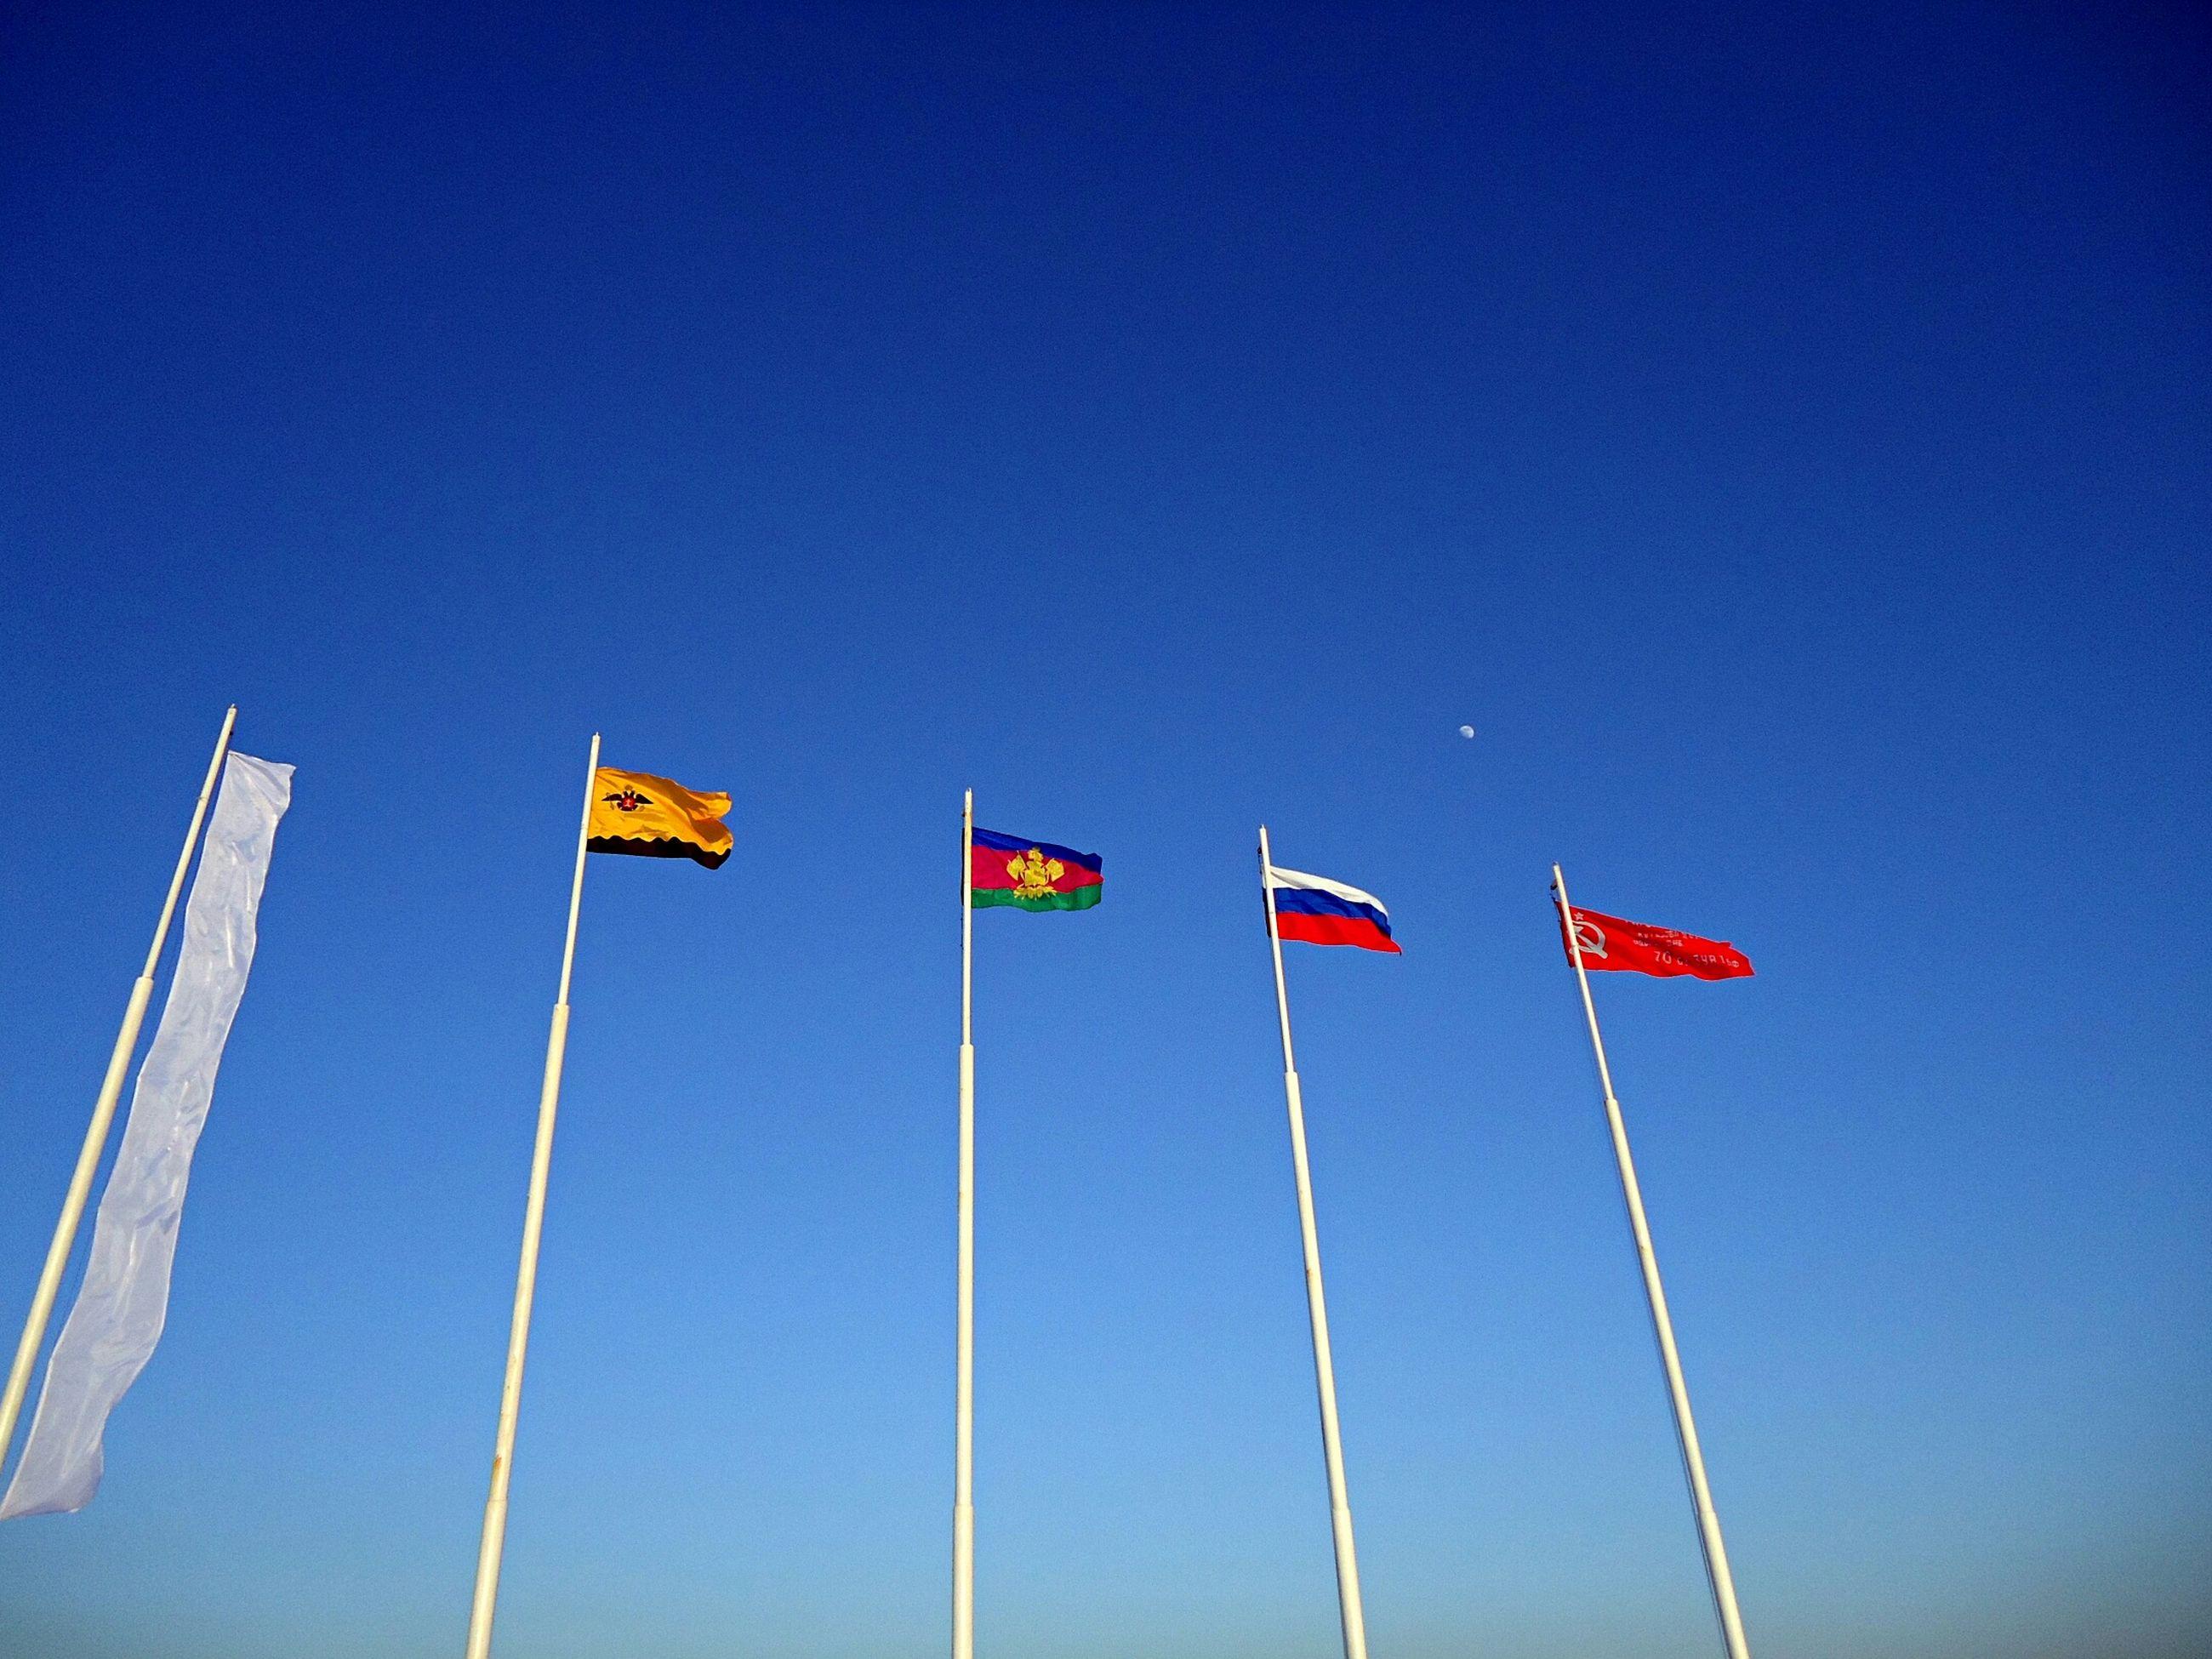 National flag waving against blue sky